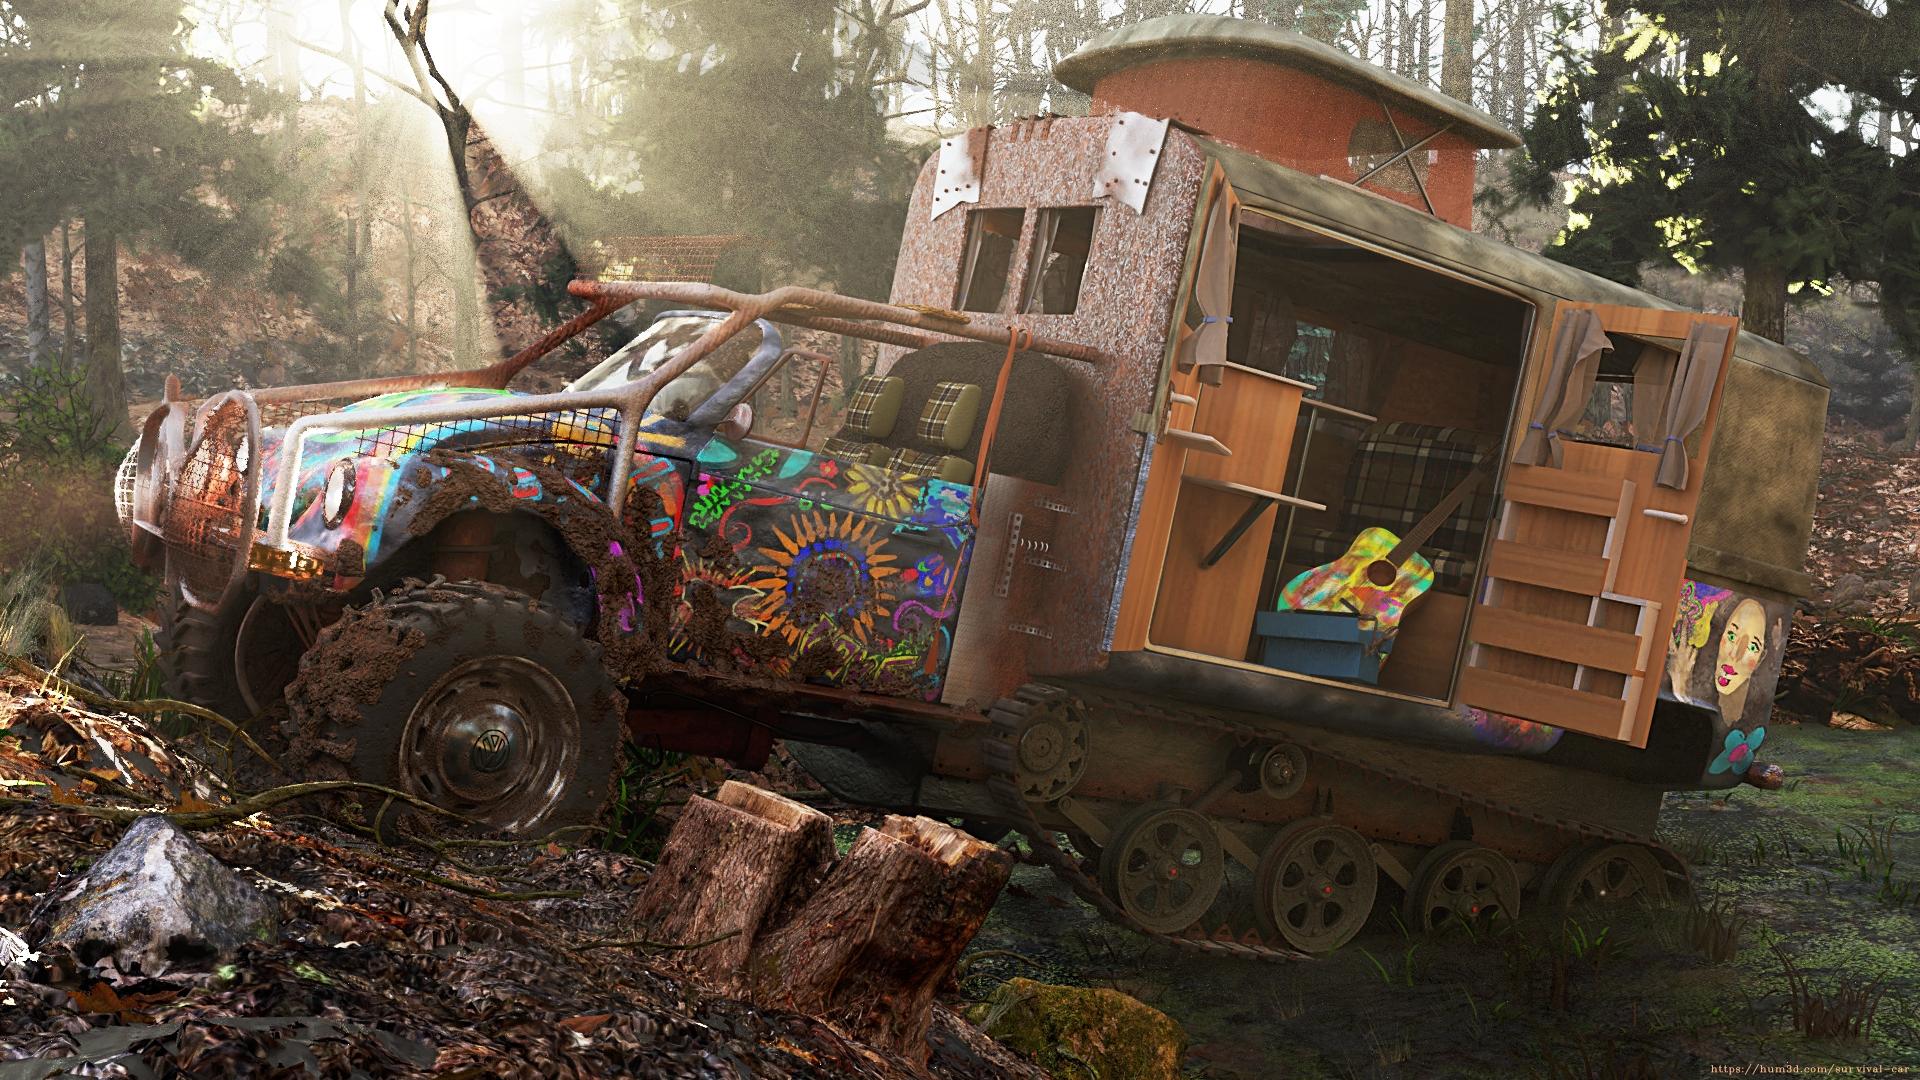 Hippie Trail 3d art